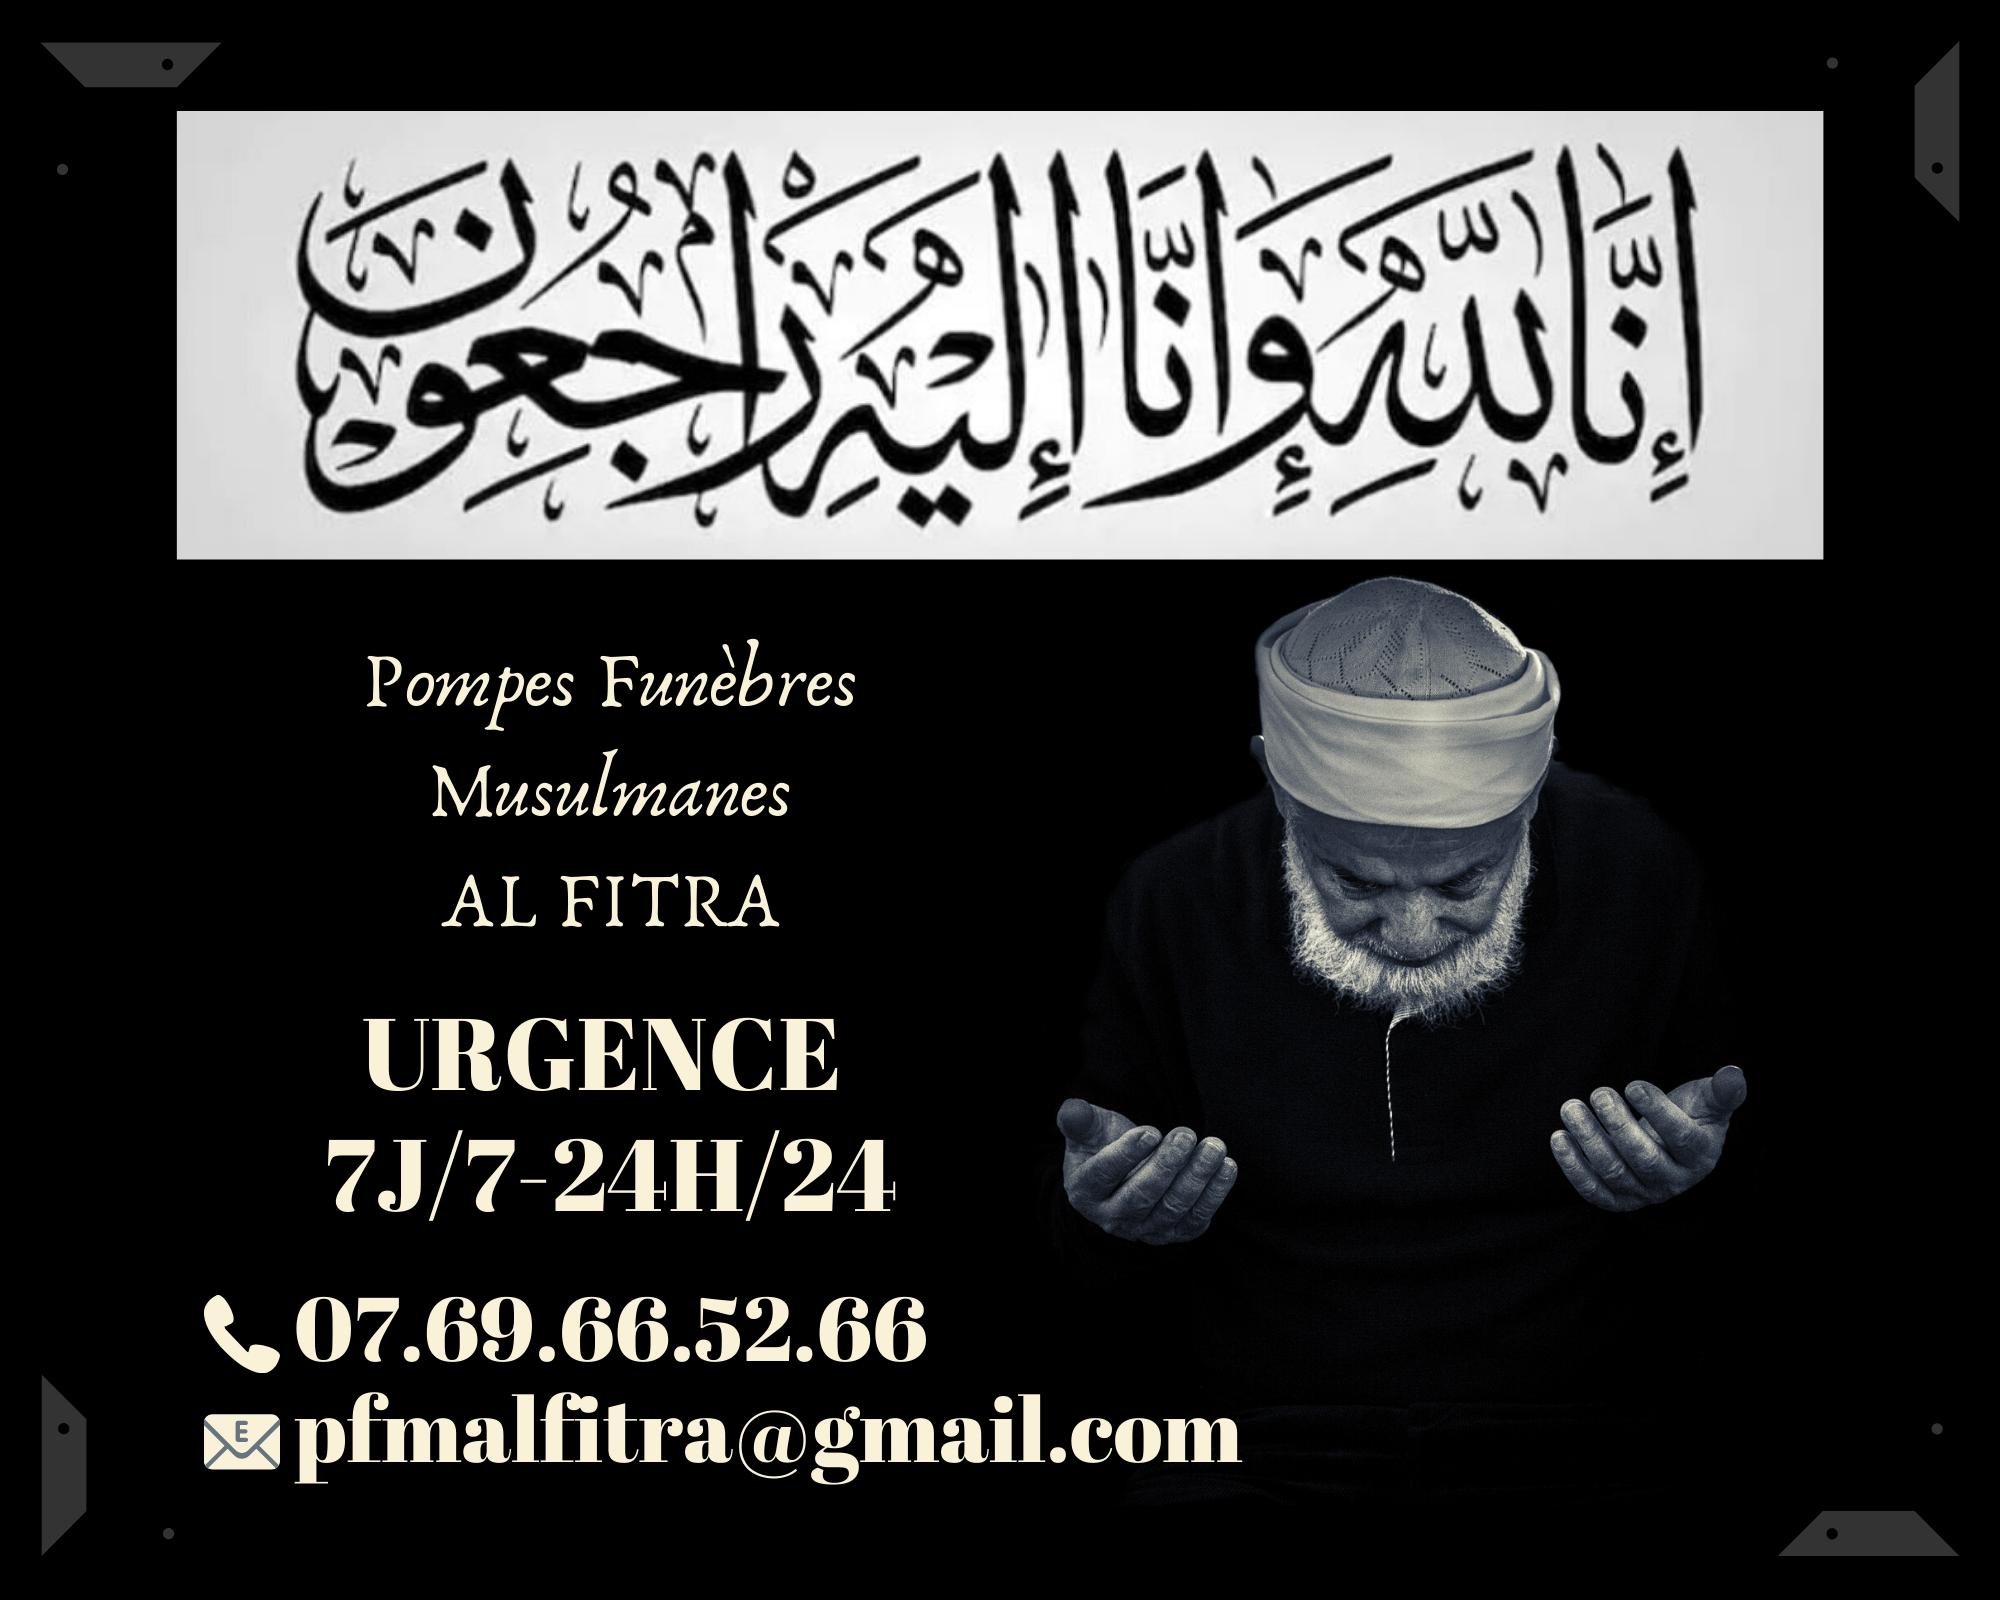 obsèques musulmanes lille